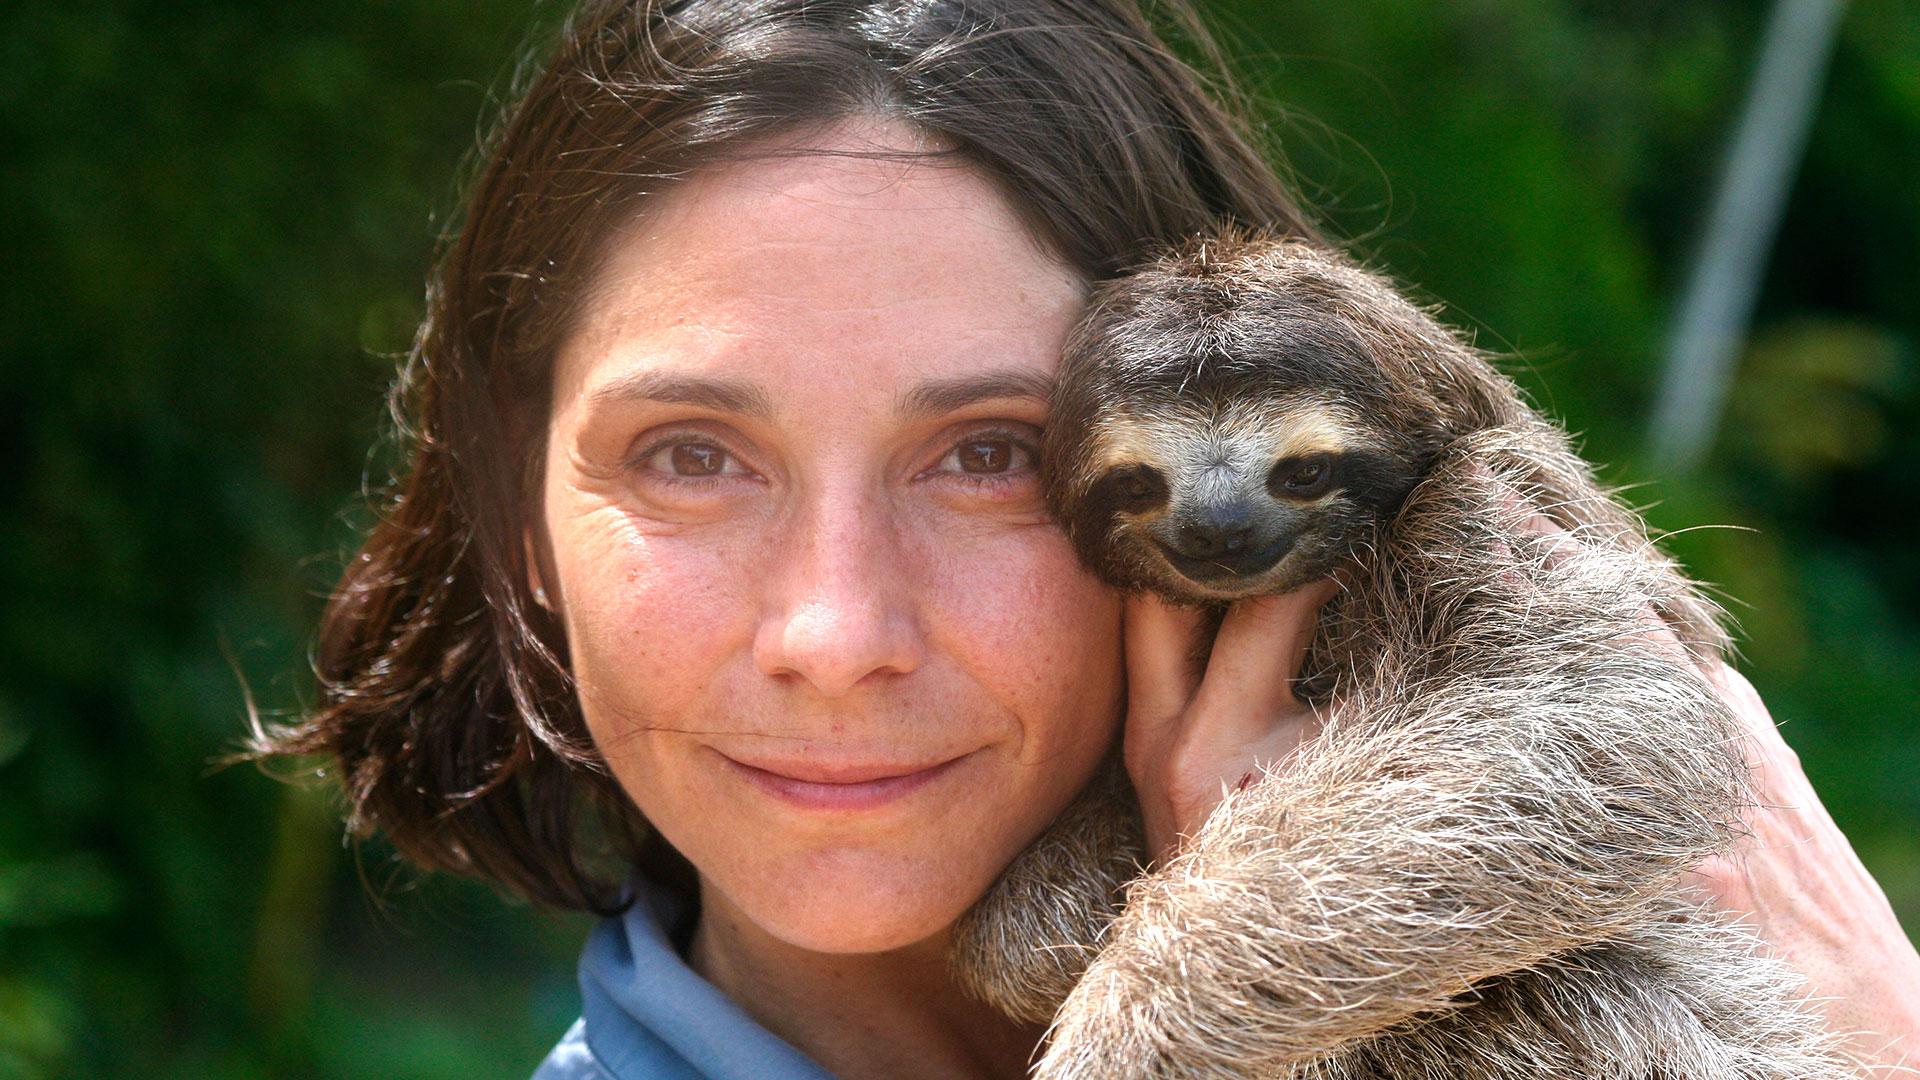 Kid Show Sloth